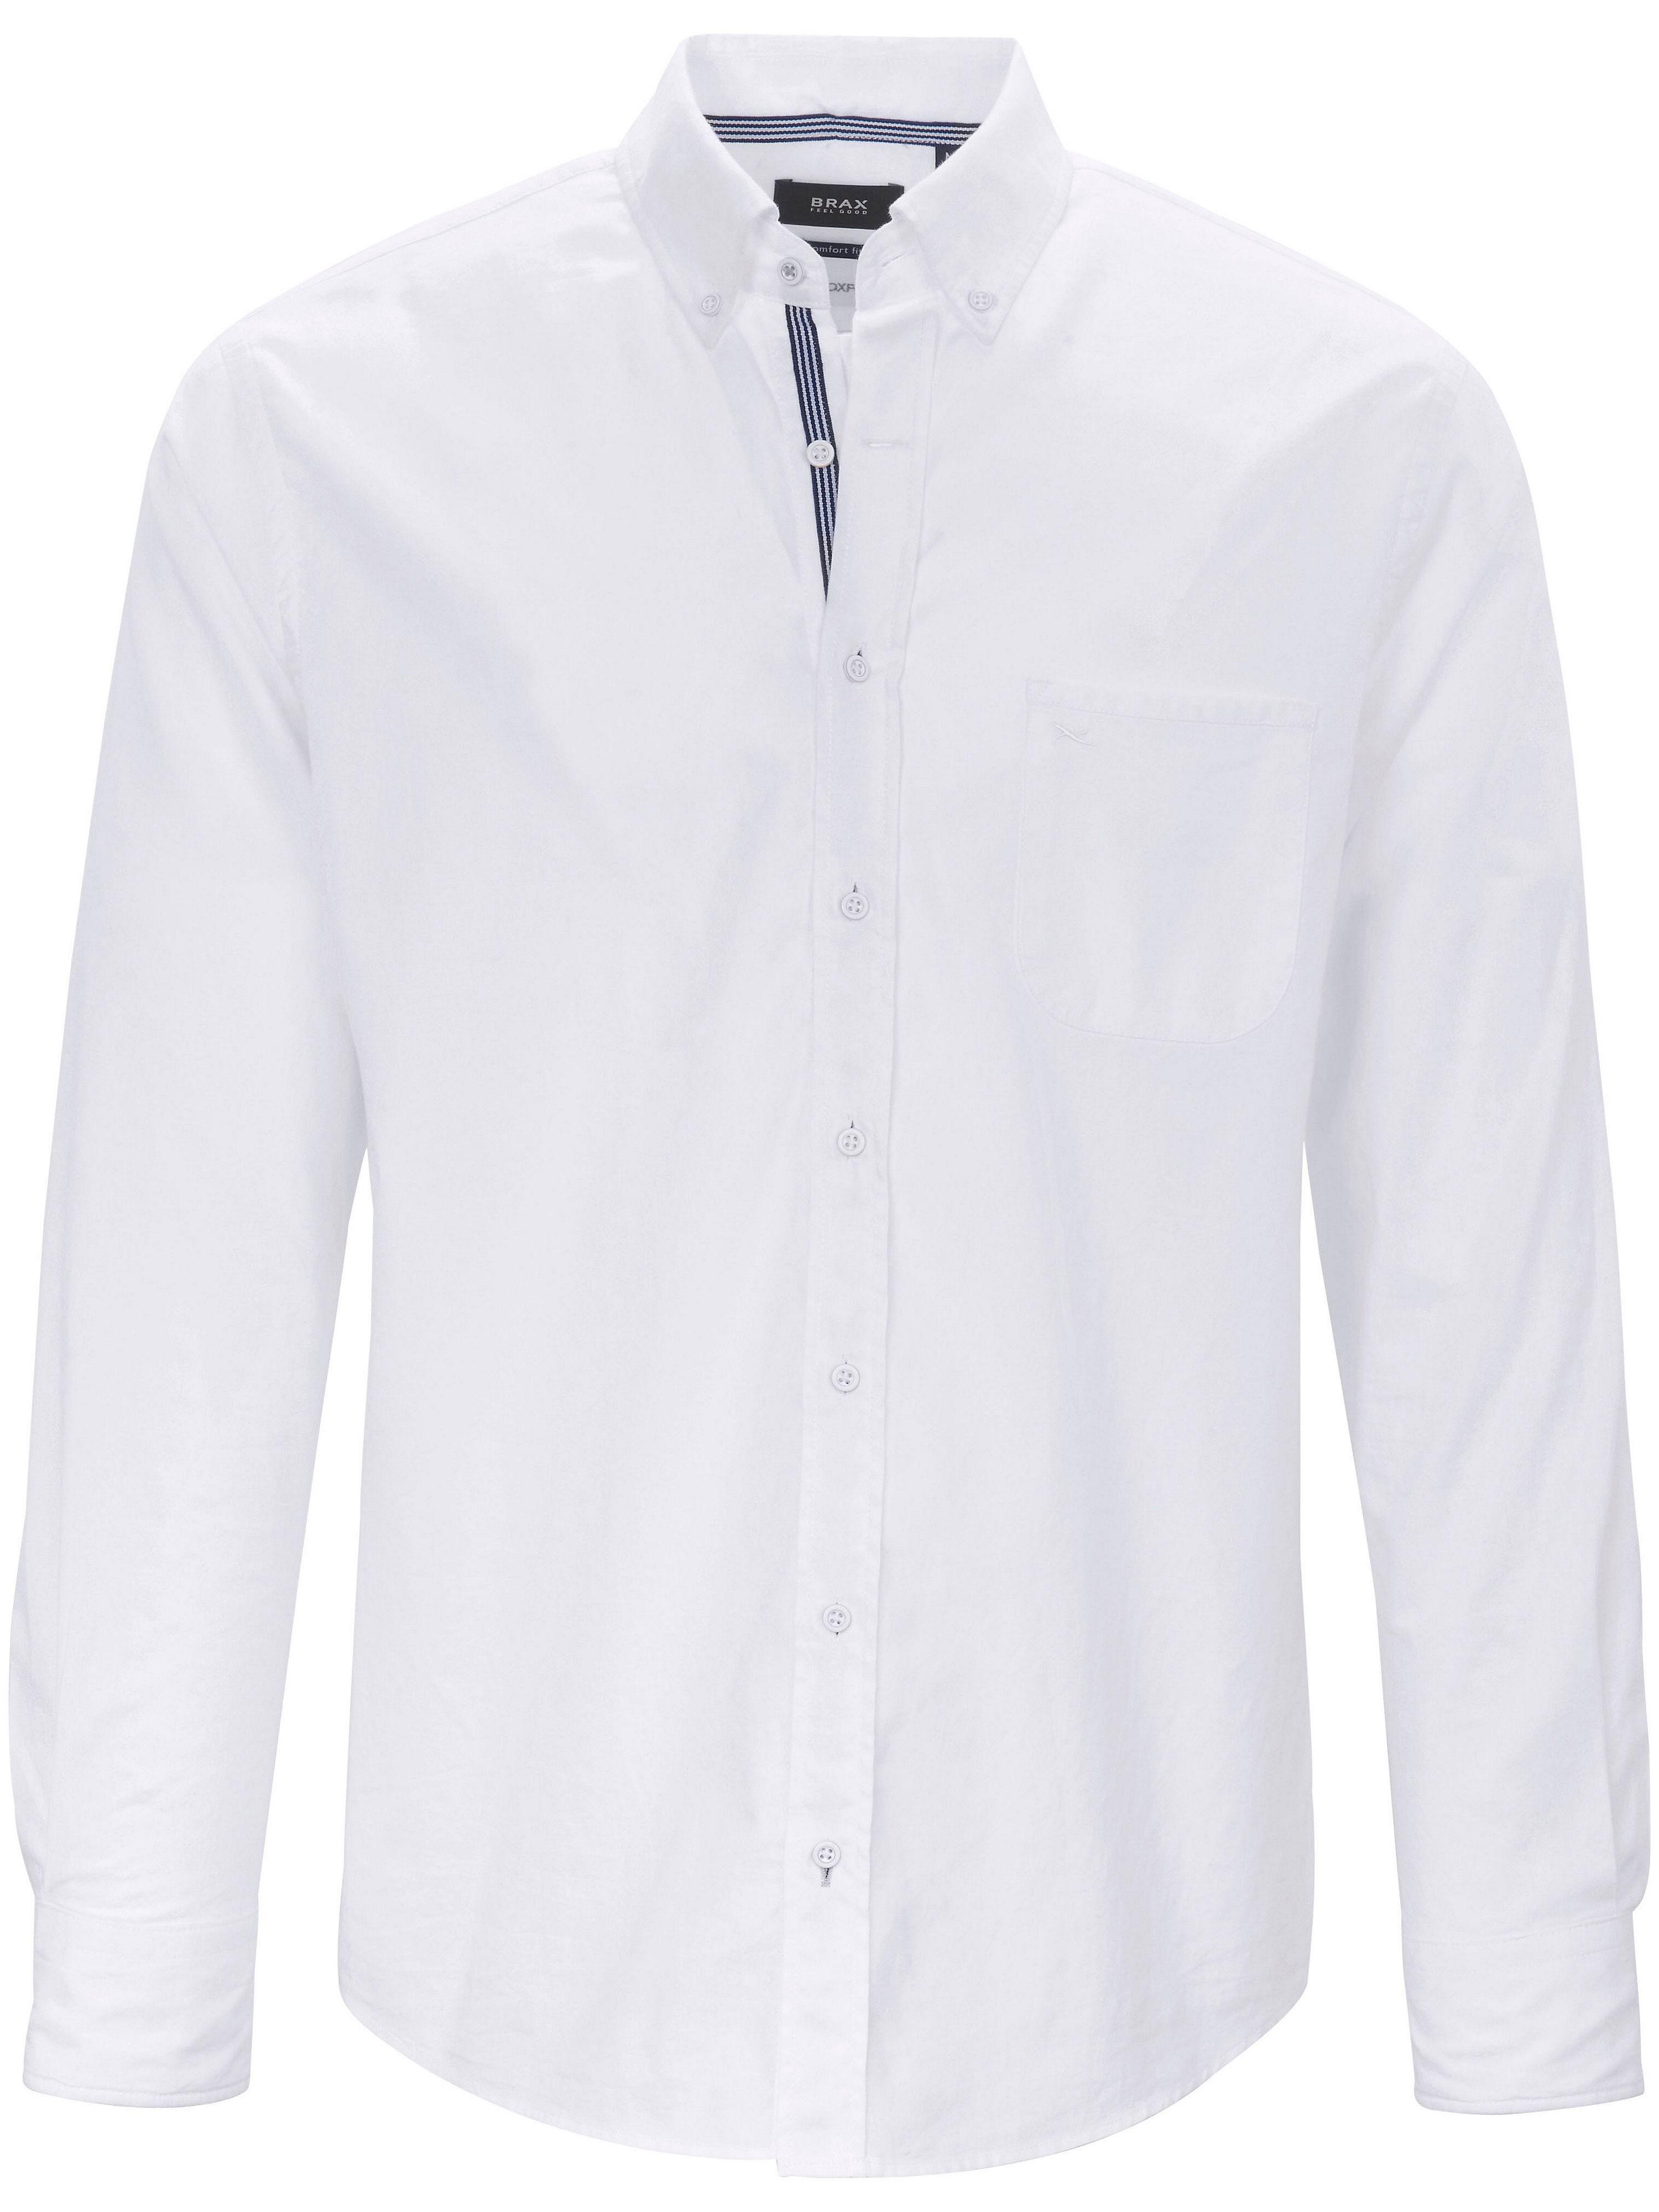 La chemise en pur coton  Brax Feel Good blanc